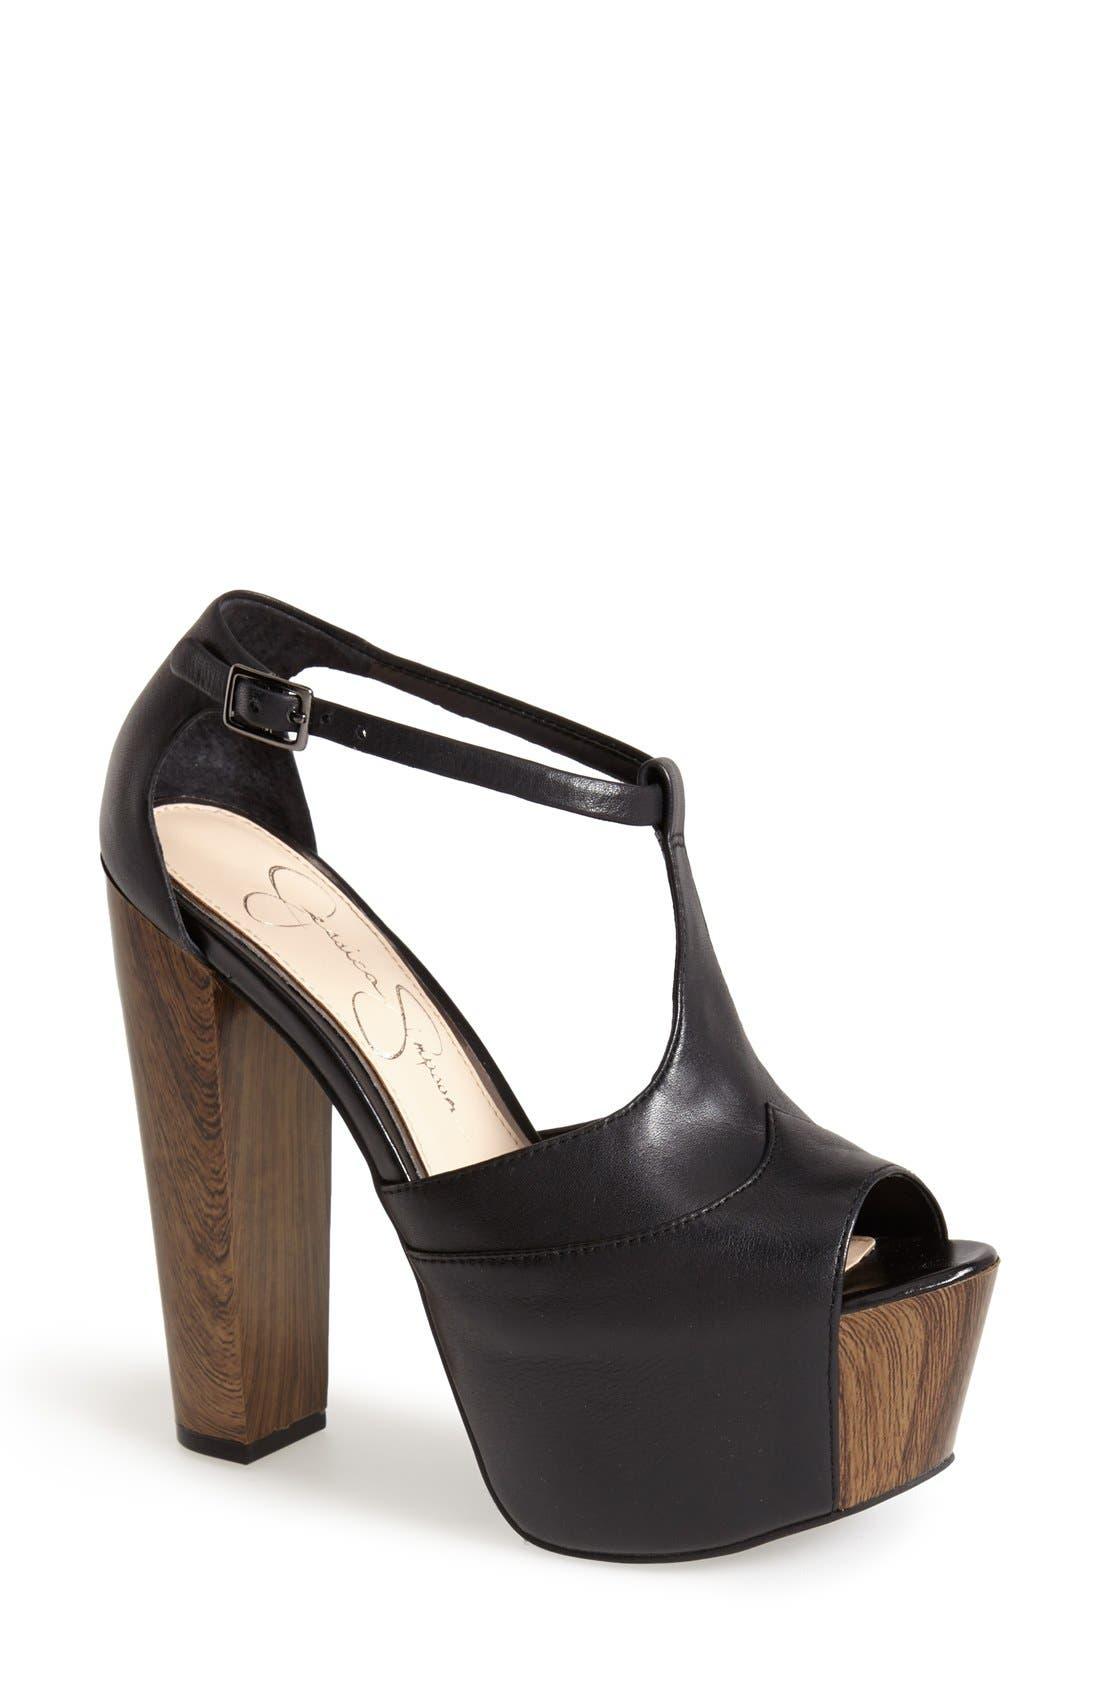 Main Image - Jessica Simpson 'Dany' Sandal